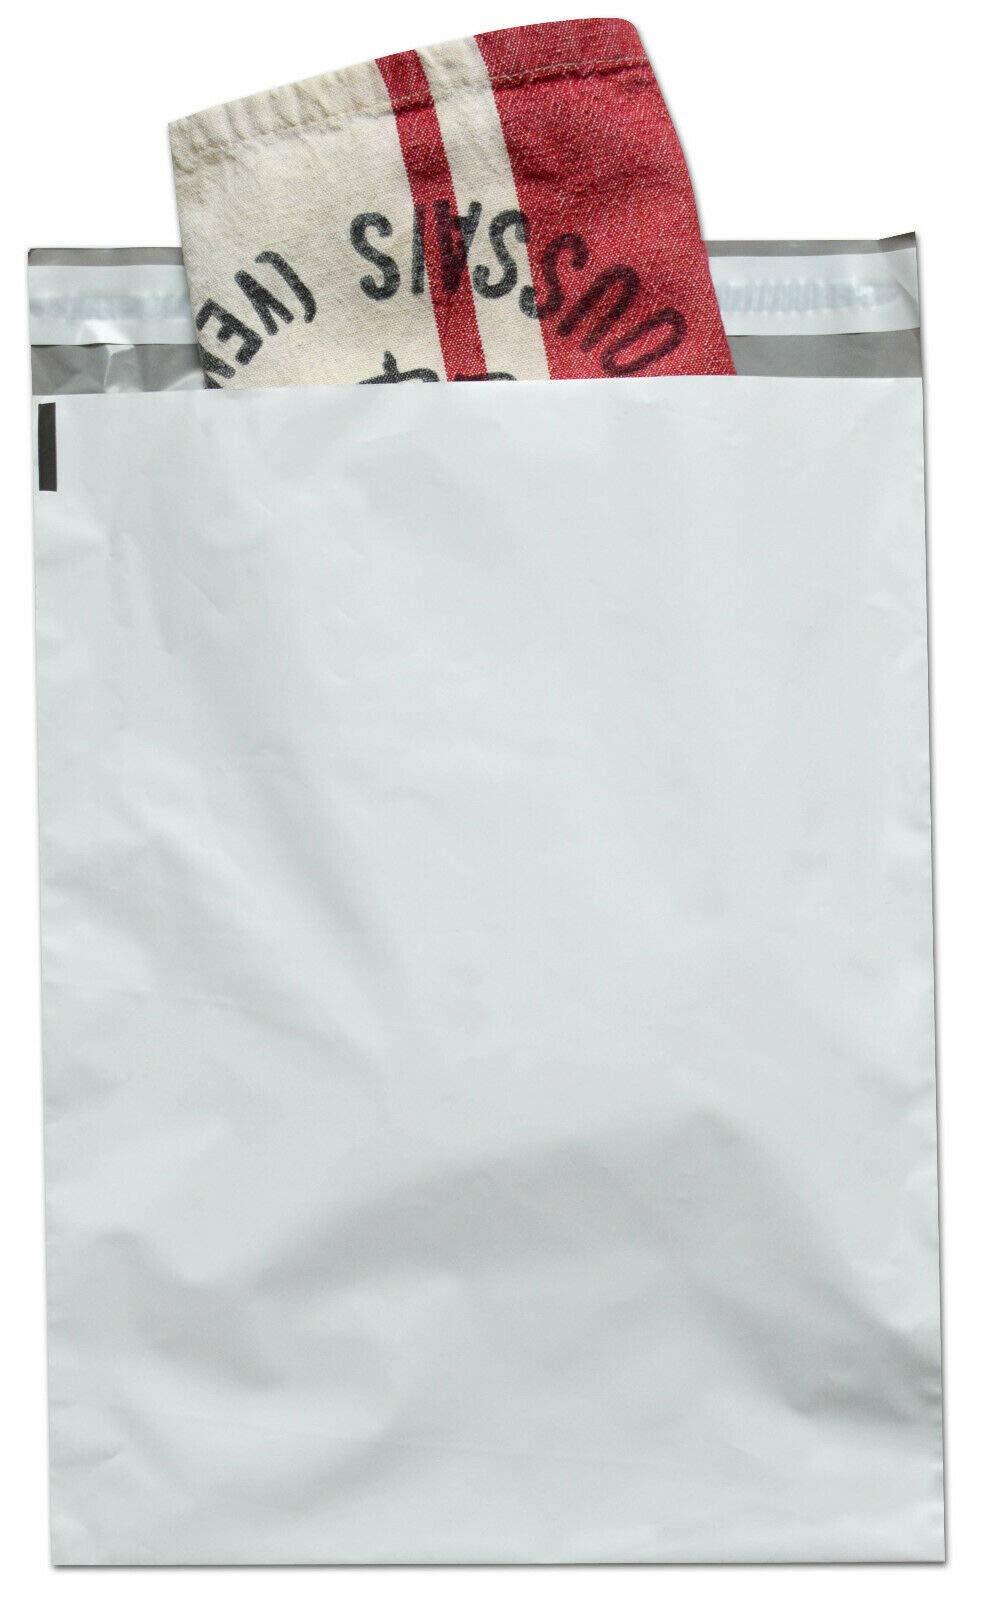 2.5 Mil Poly Mailer Envelopes, 7 1/2 x 10 1/2 Inch, Self Adhesive Sealing Strip, White, 1000 Pack